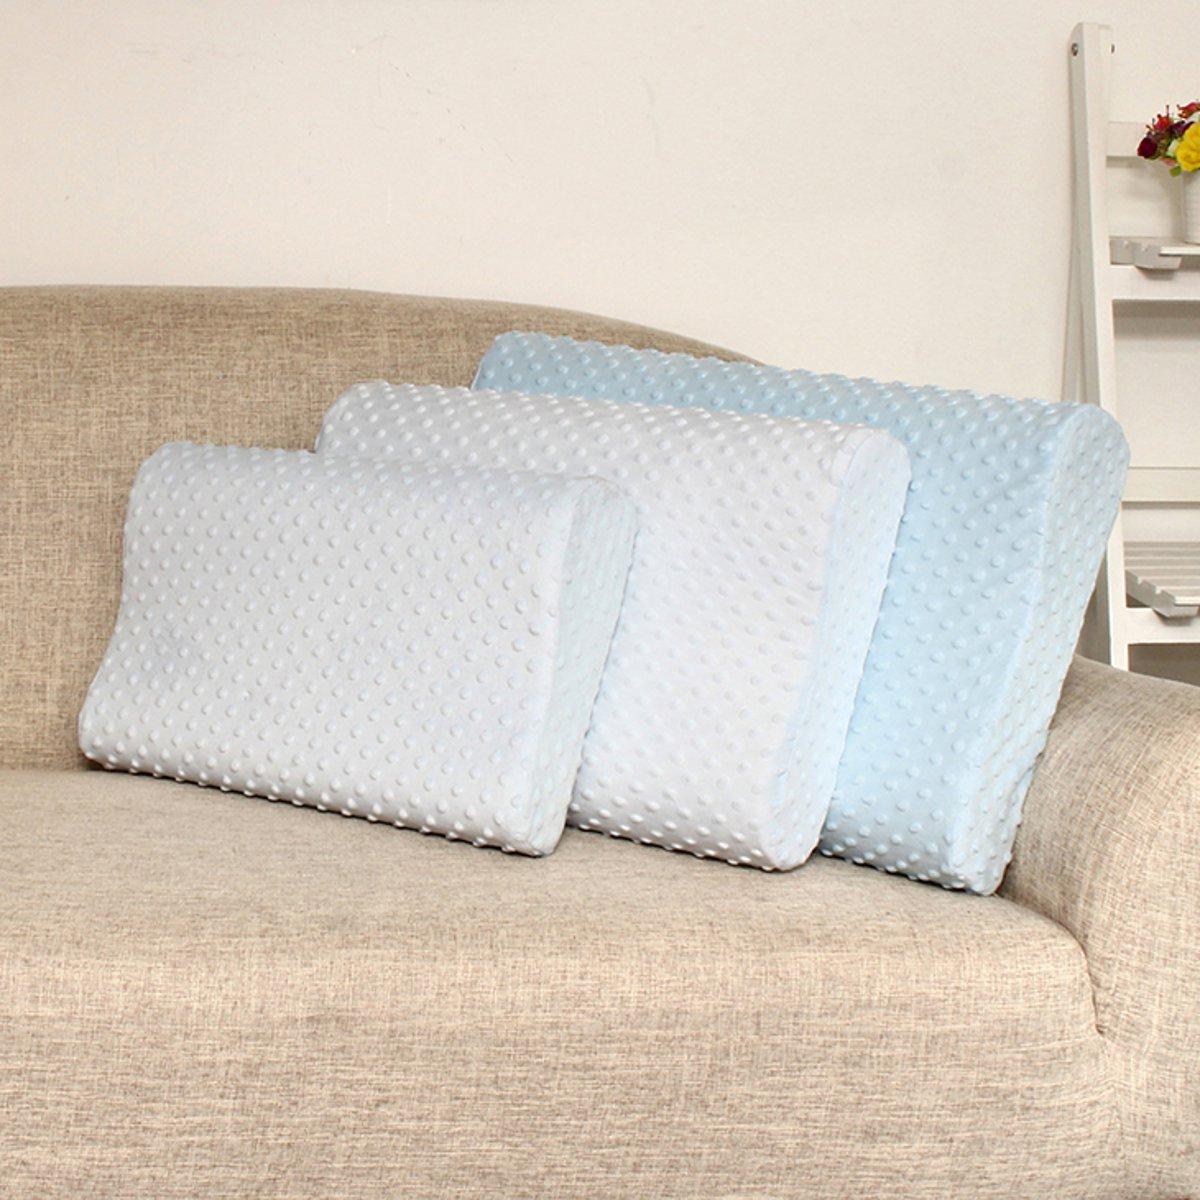 Memory Foam Slow Rebound Contour Neck Pillow Sleep Care Bed Home Travel Pillow Health